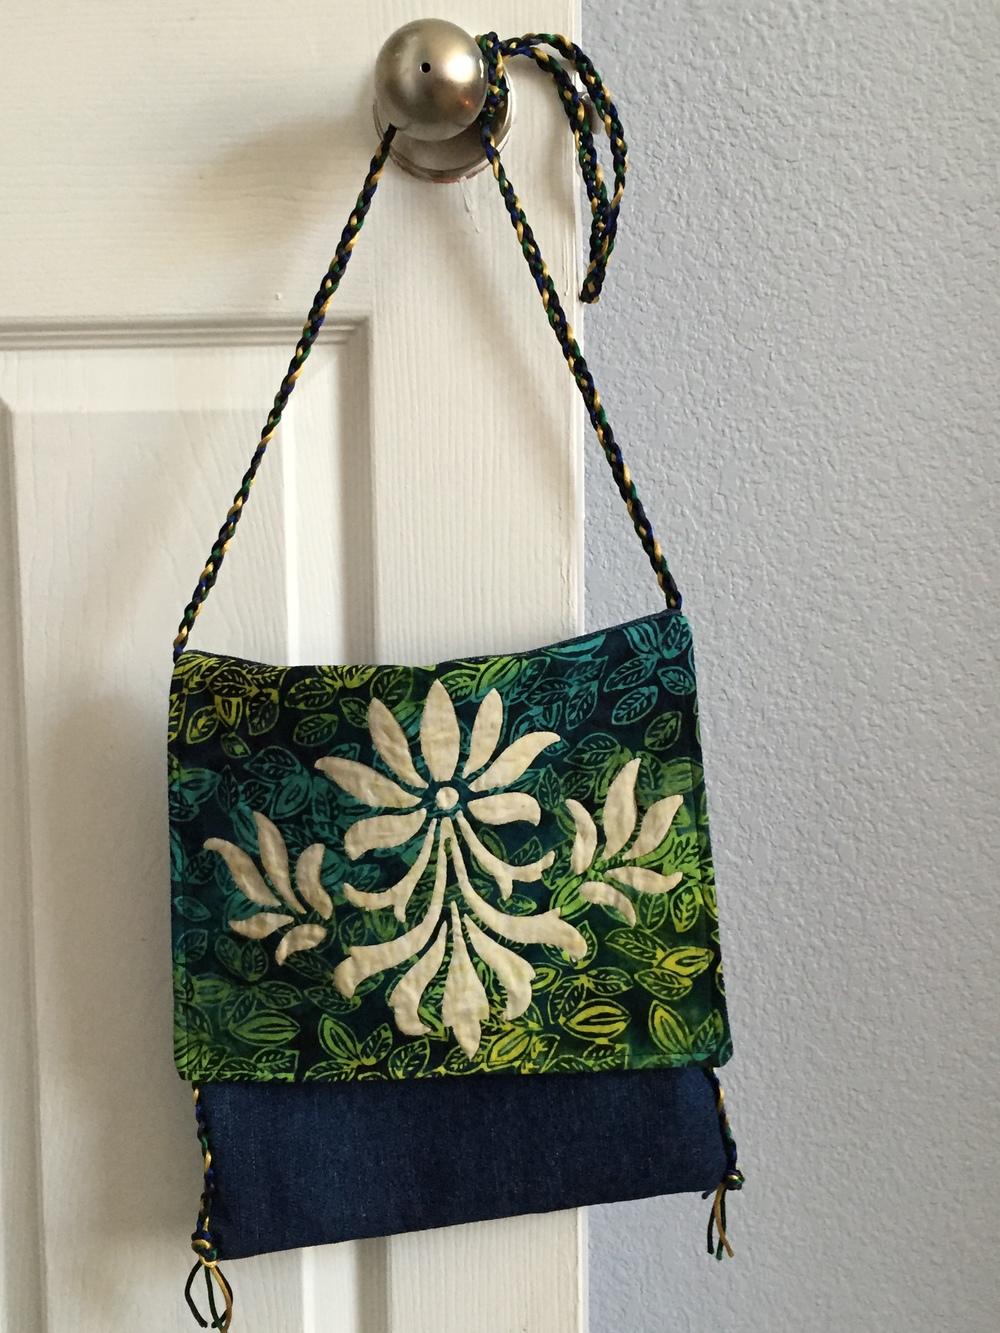 Bag created using Fleur de Lis block on the front flap.